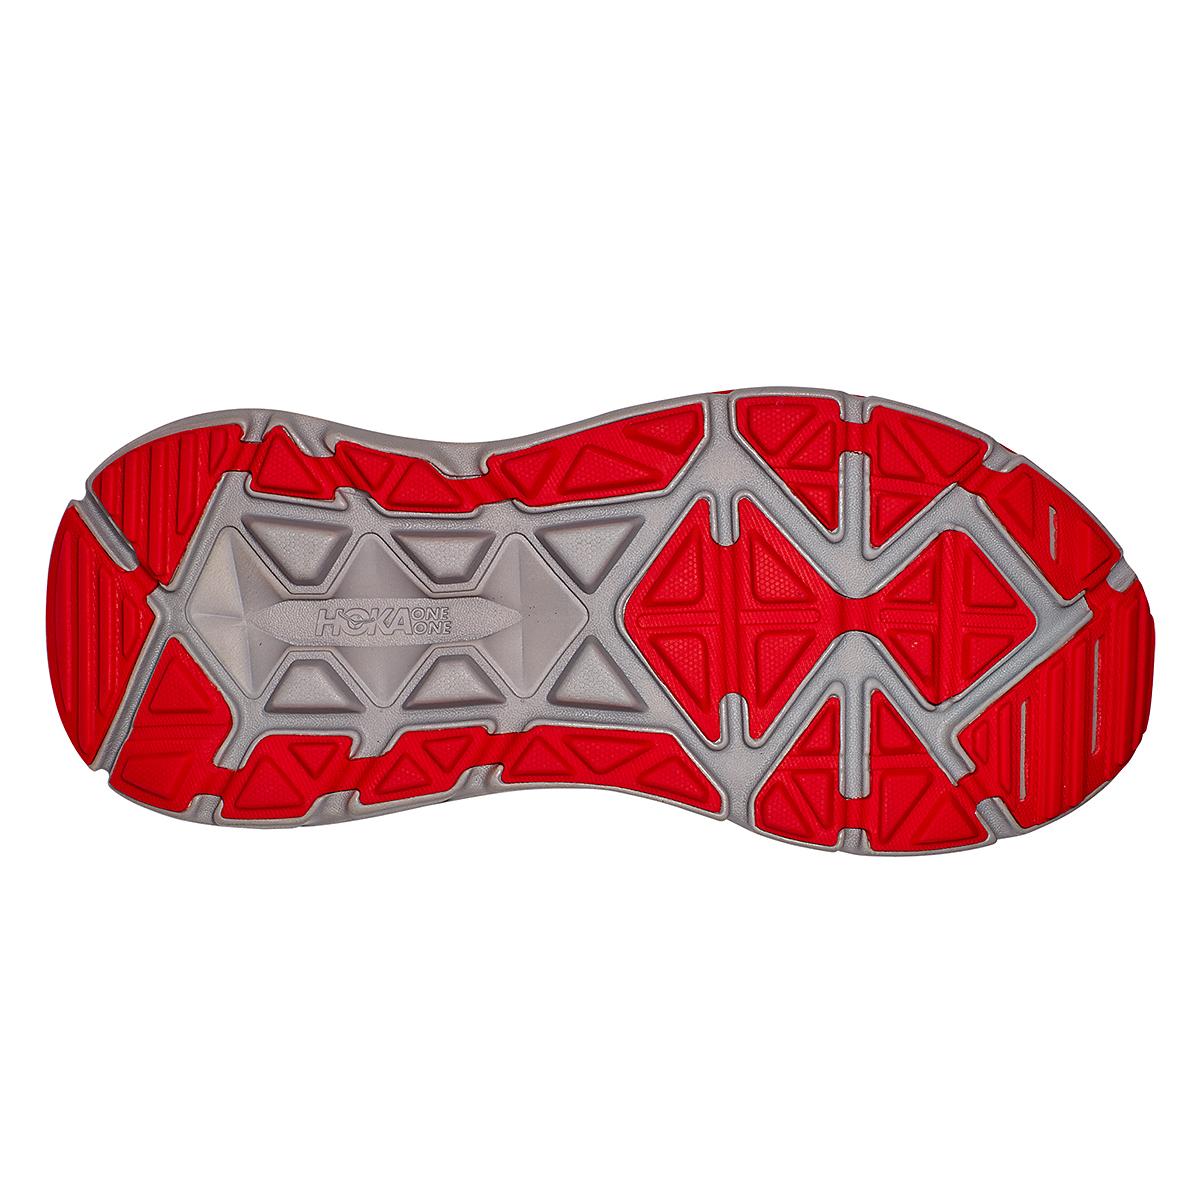 Men's Hoka One One Stinson Atr 6 Trail Running Shoe - Color: Dark Blue/High Risk Red - Size: 7 - Width: Regular, Dark Blue/High Risk Red, large, image 3